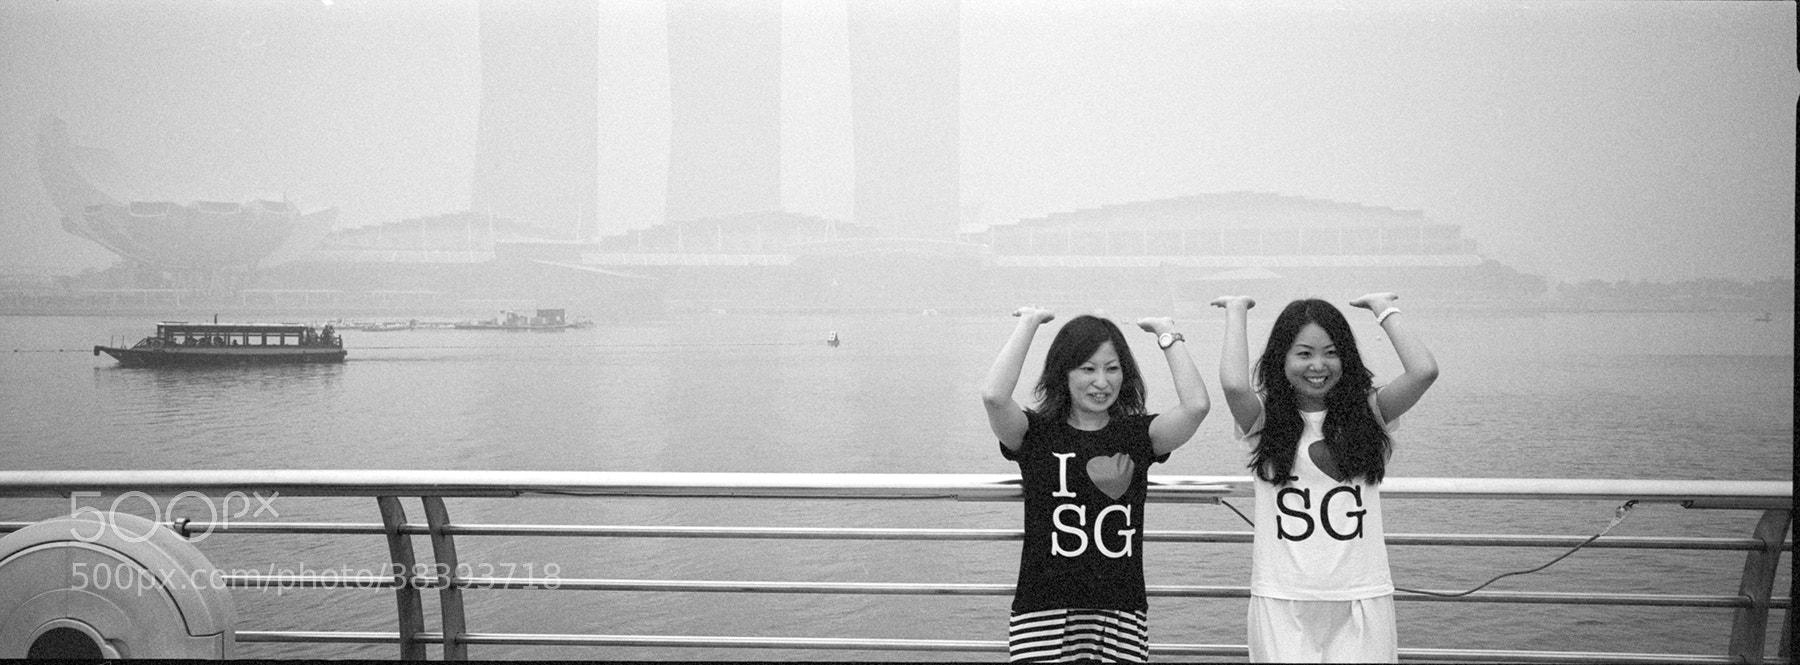 Photograph haze days, 2013 by  momofuku on 500px